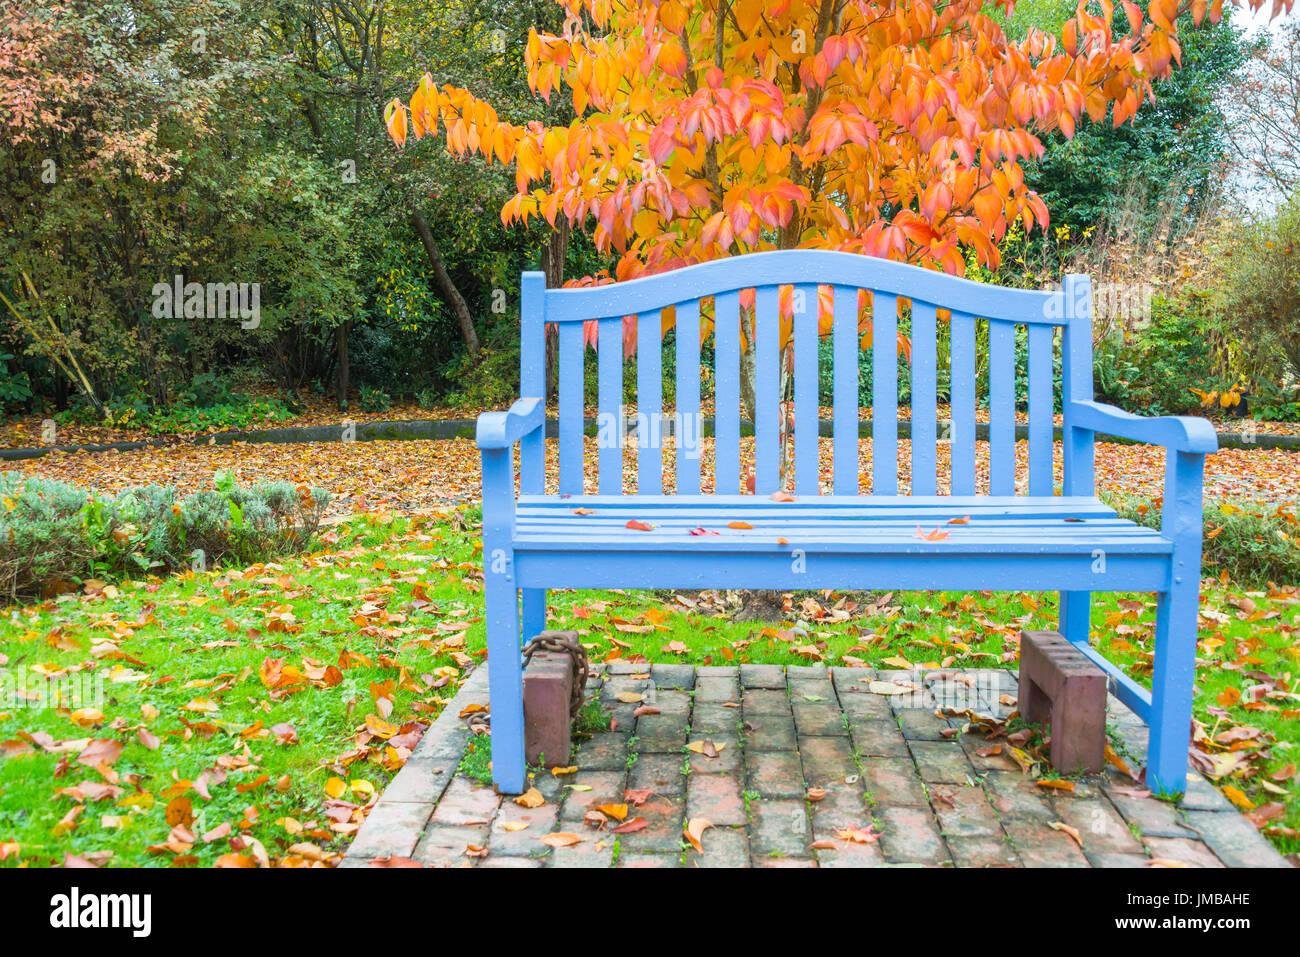 Himmelblau-Bank im Park mit Farbe Orange Herbst Baum Stockbild